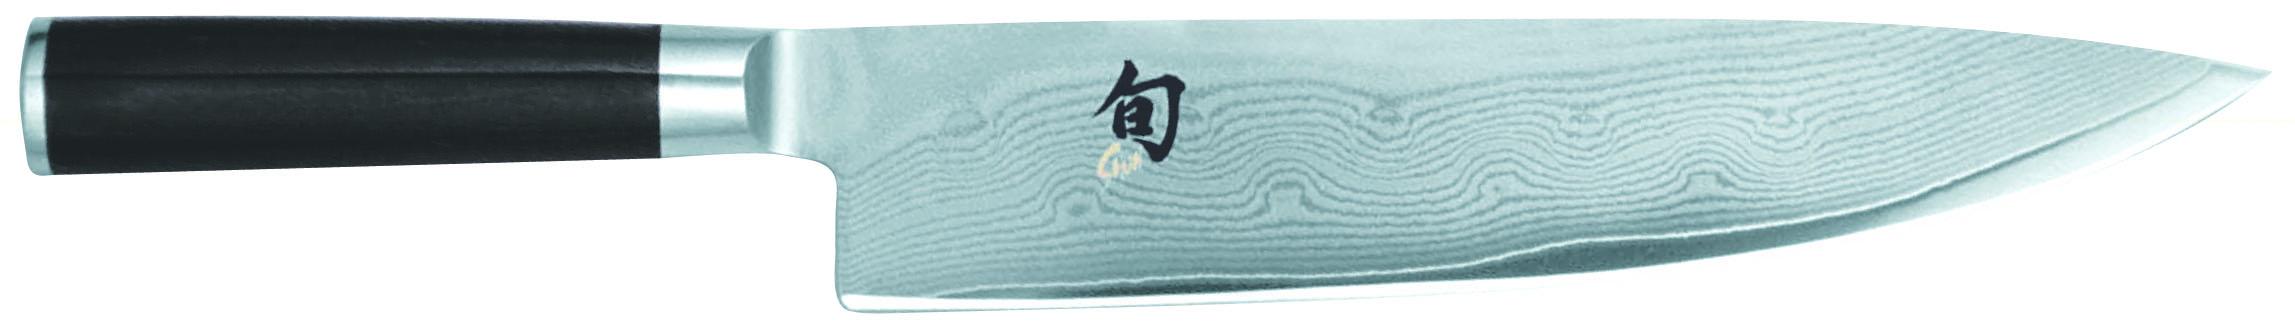 Kai Shun Classic DM-0707 Kockkniv 25,5 cm